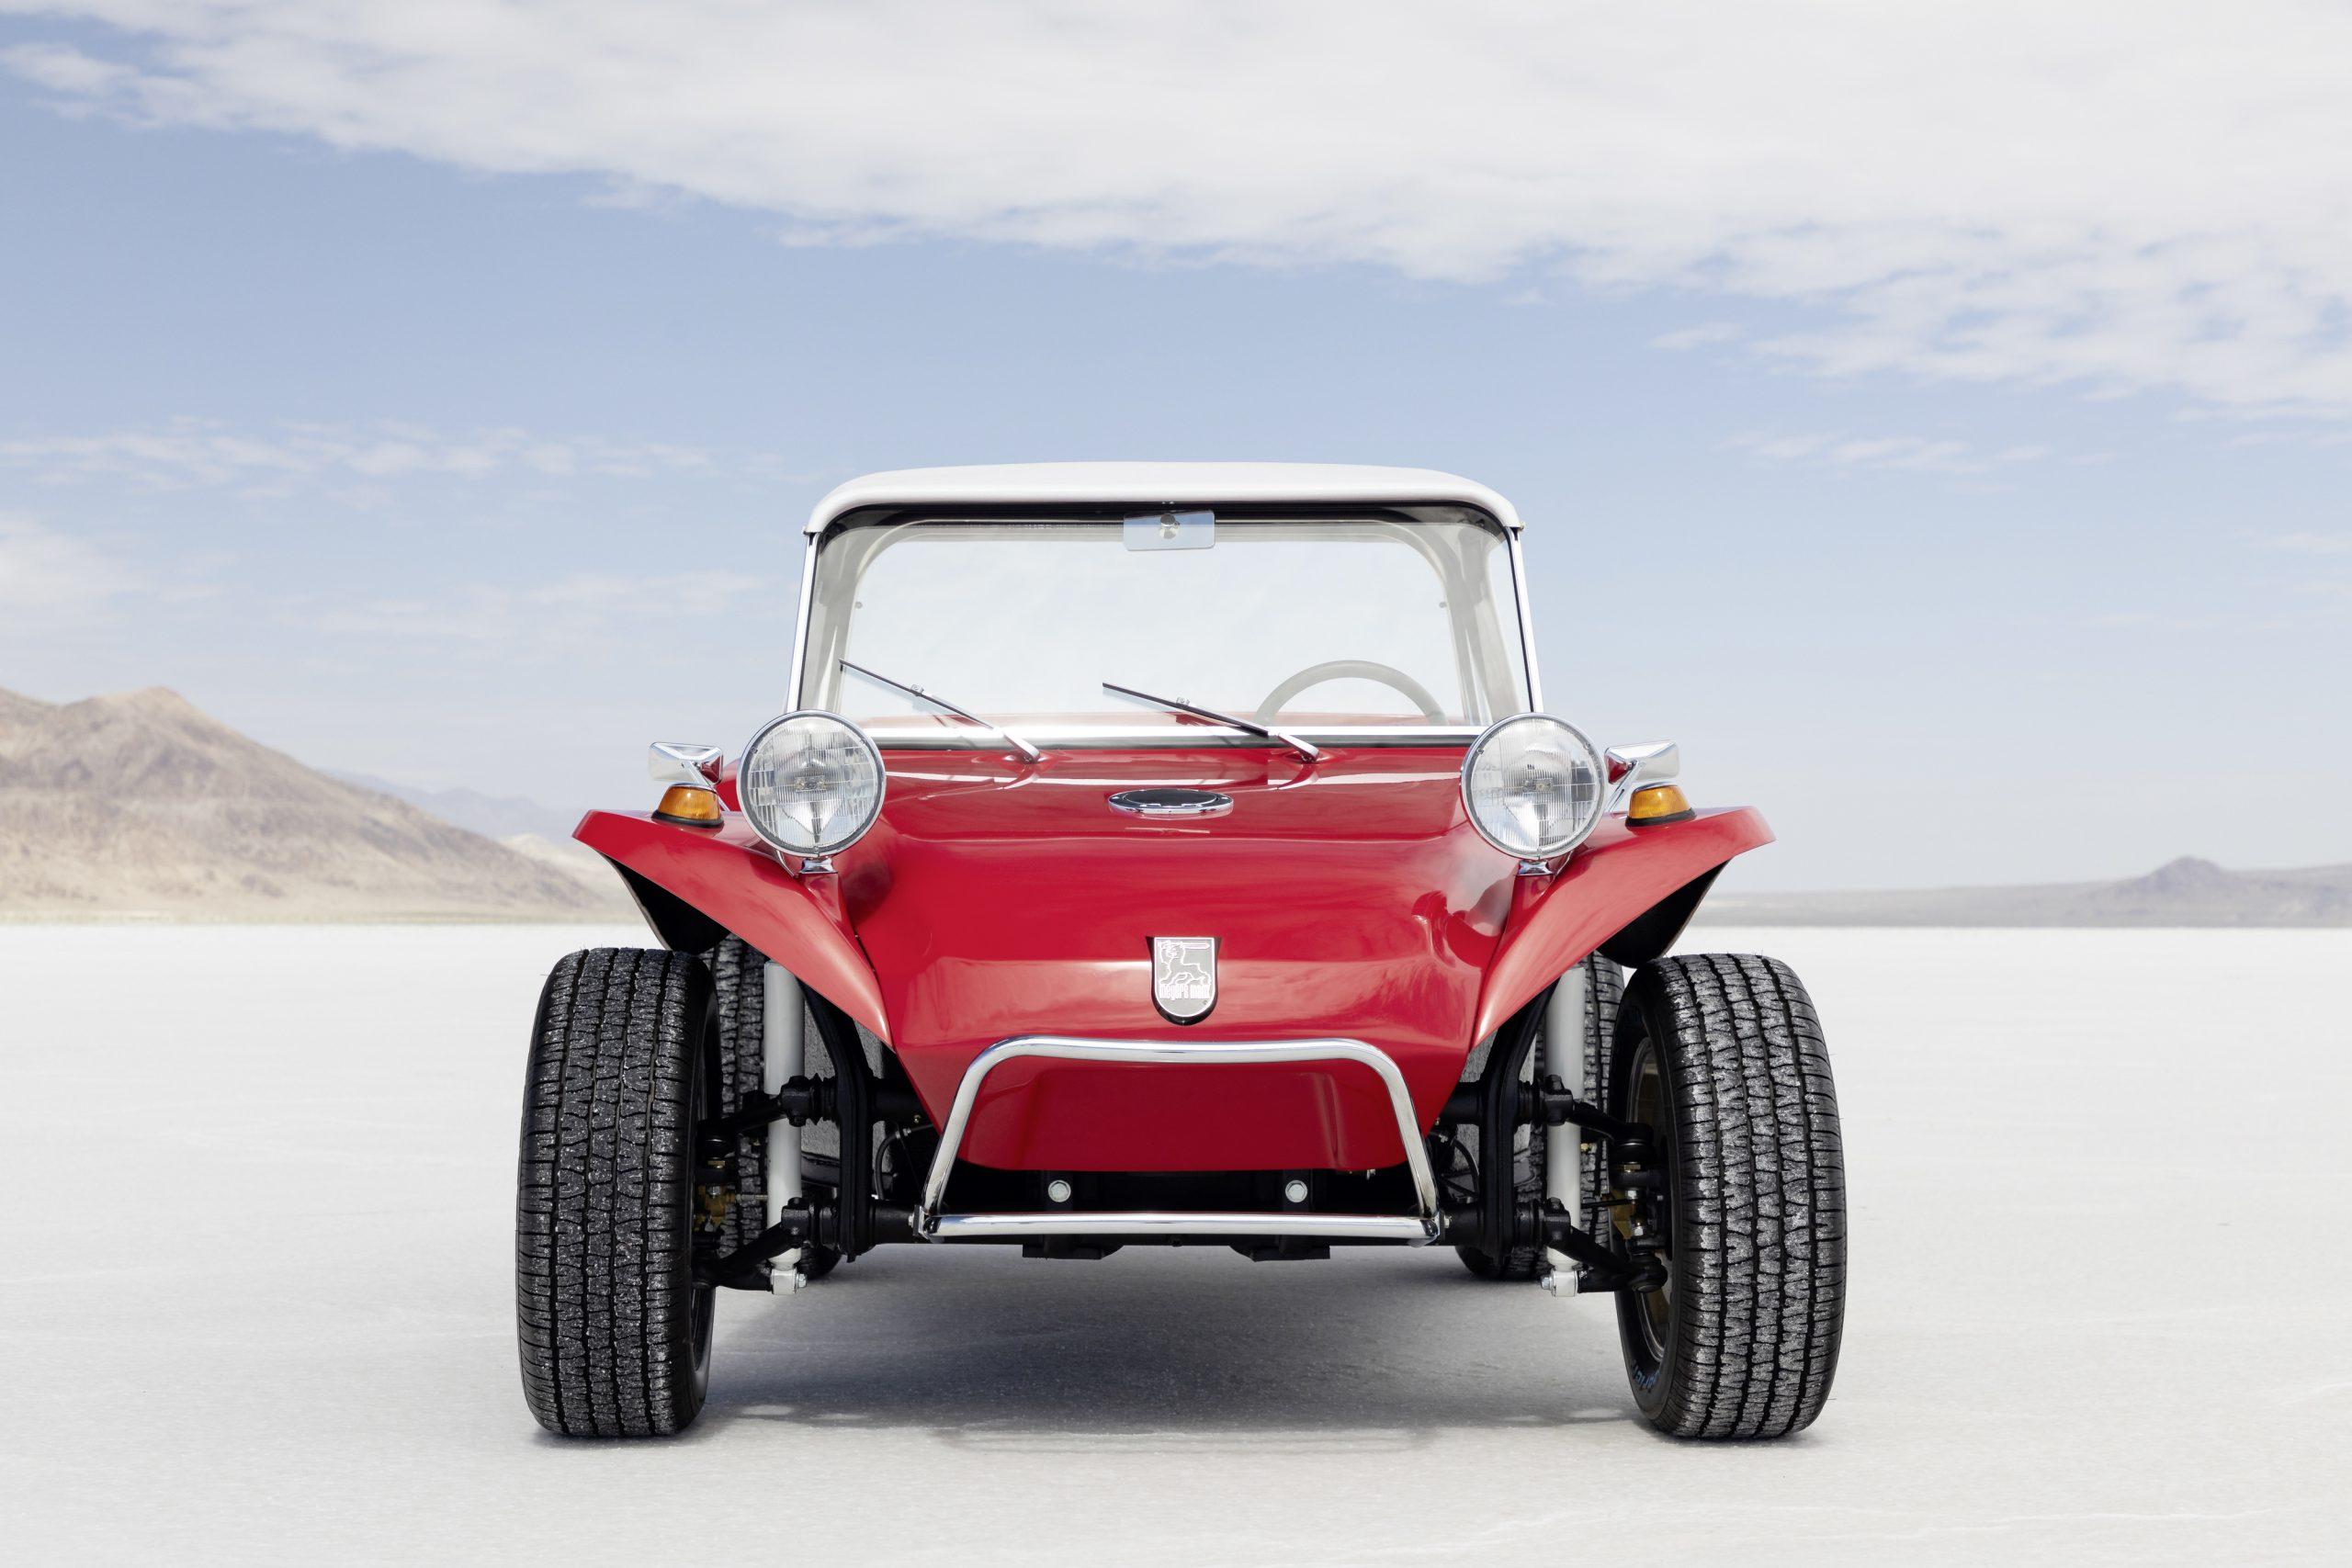 Meyers Manx Fiberglass Dune Buggy front